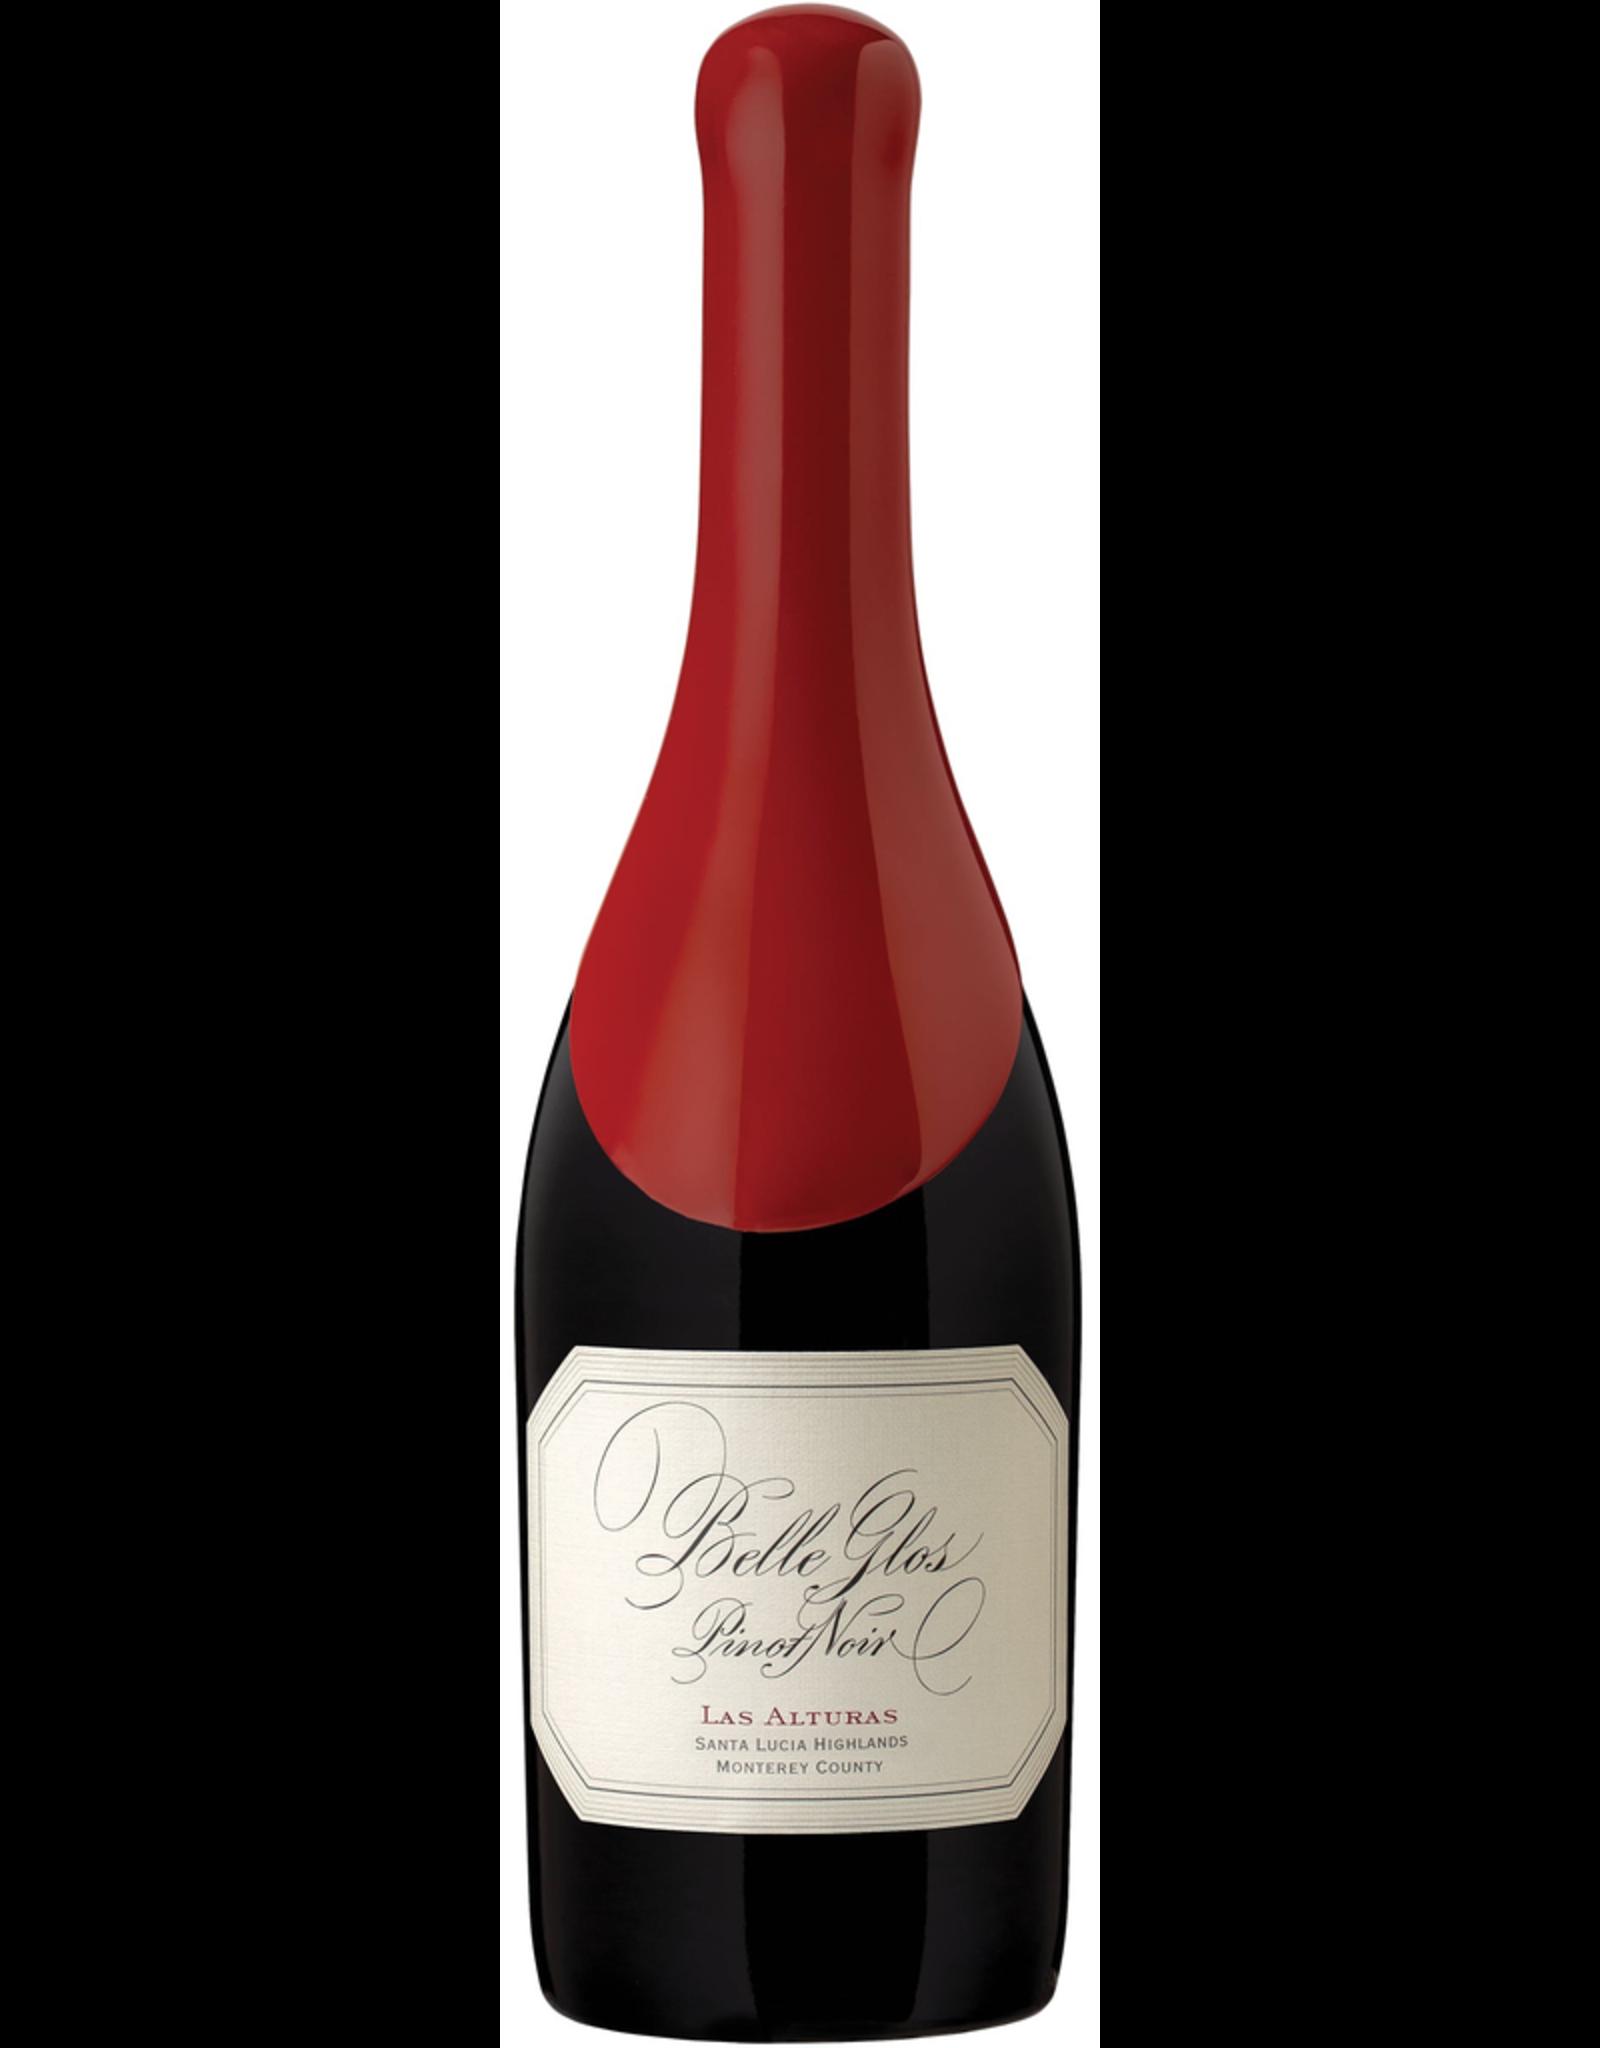 Red Wine Belle Glos, Las Alturas Vineyard, Pinot Noir, Santa Lucia Highlands, Monterey County, California,14.7% Alc, CT91